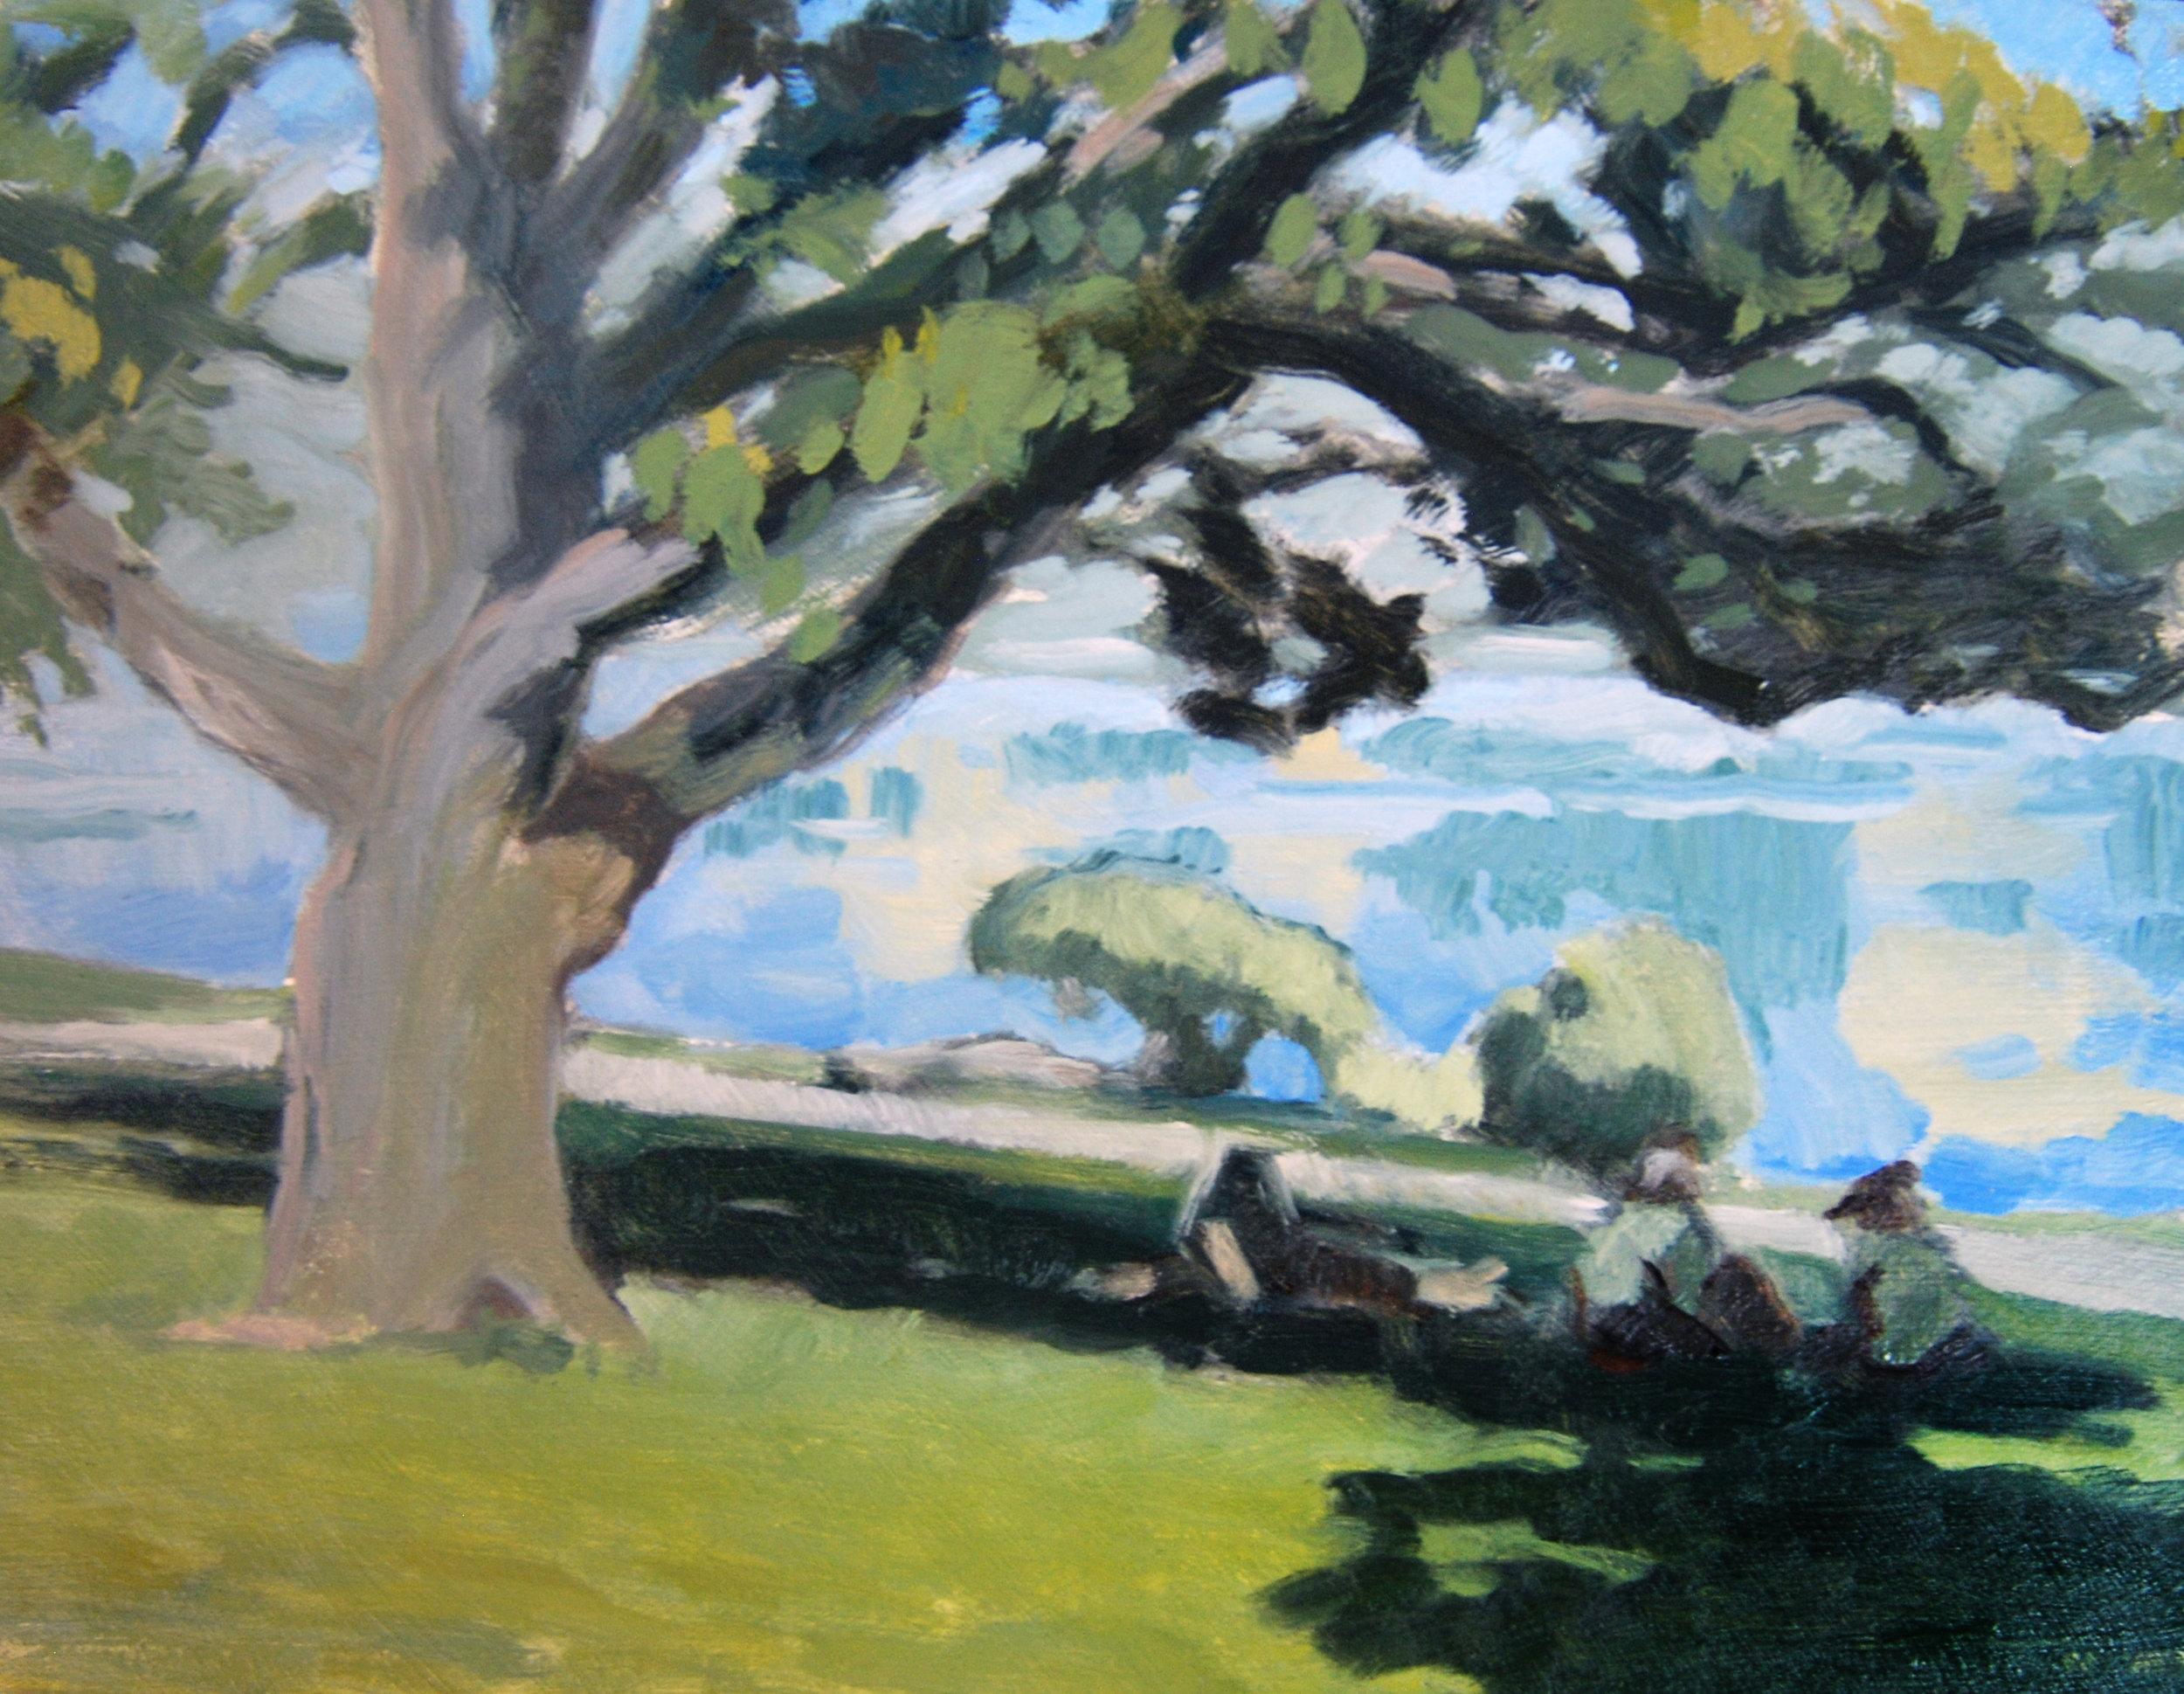 Le Déjeuner sur Lake Merritt.  8 x 10 in.  Oil on panel. Private collection. (2017)